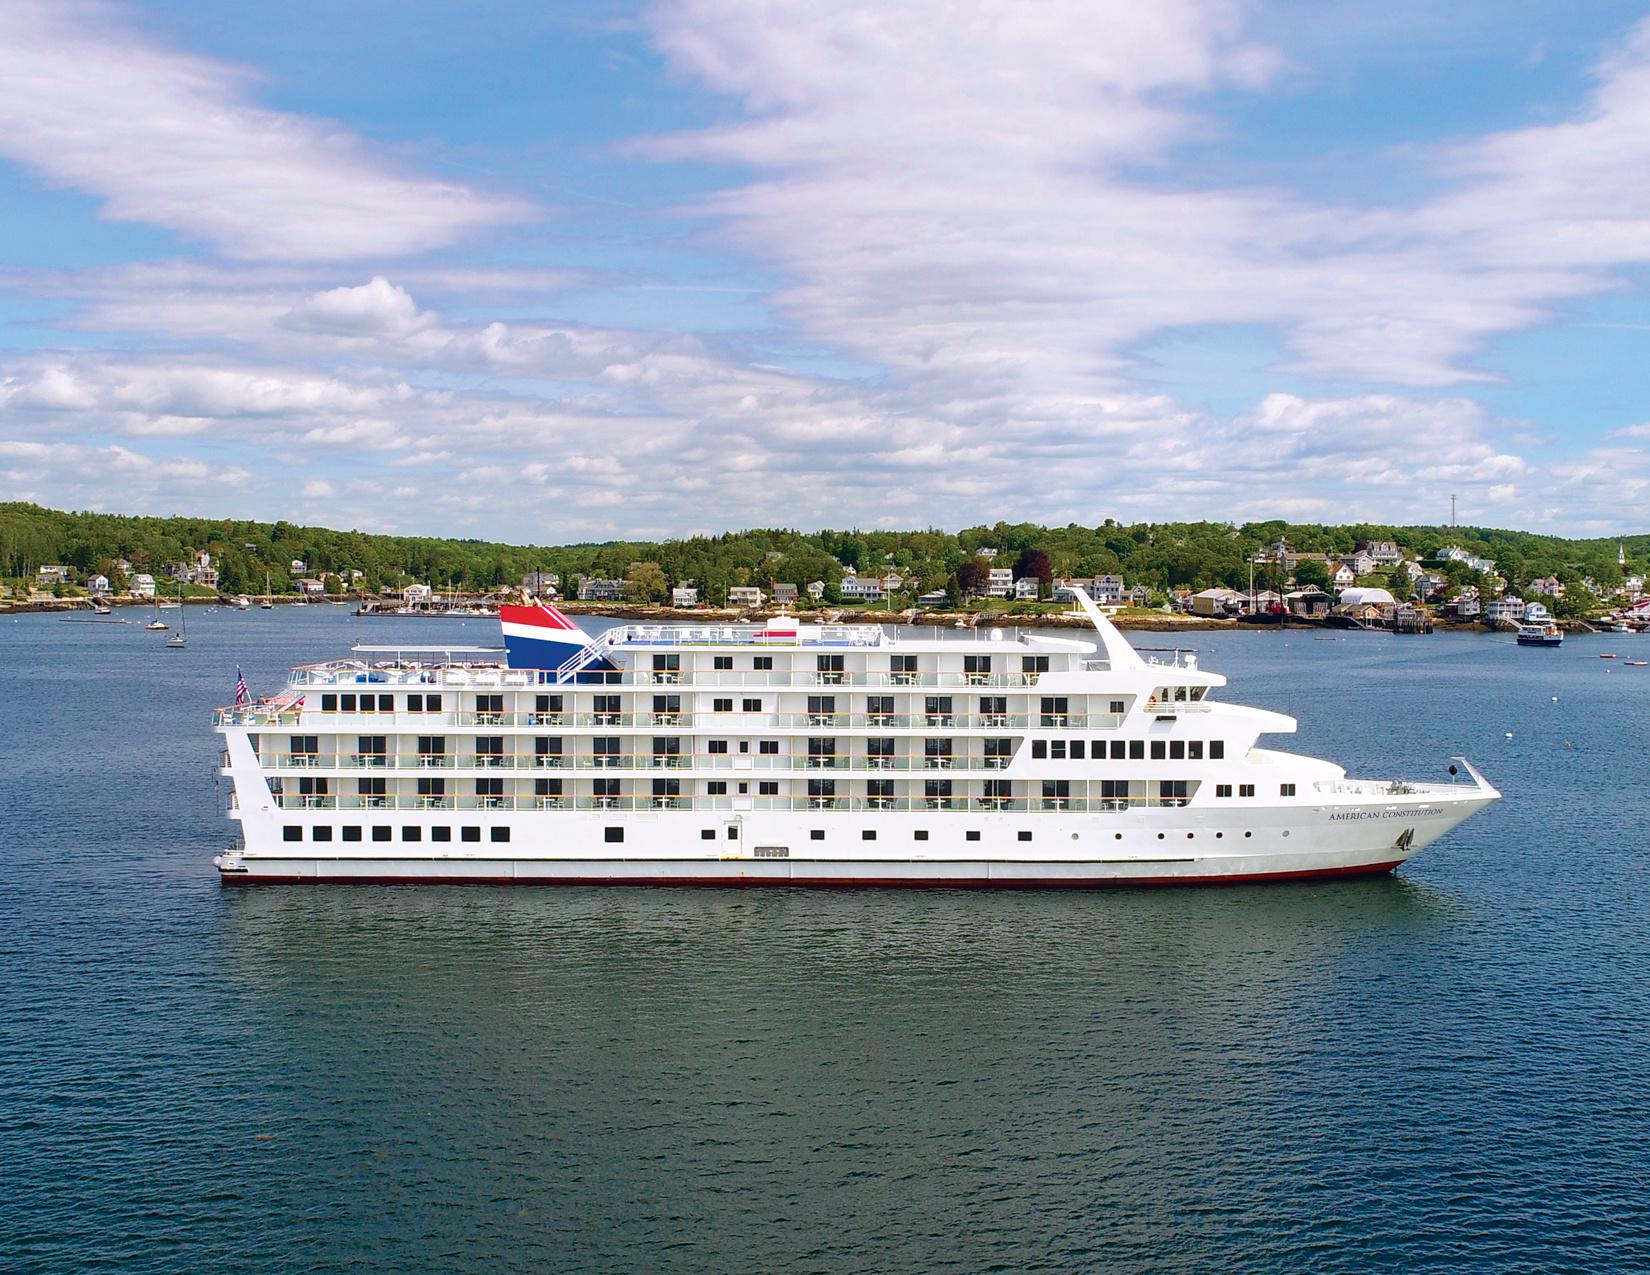 American Cruise Lines Announces Sponsorship Of PBS' Washington Week